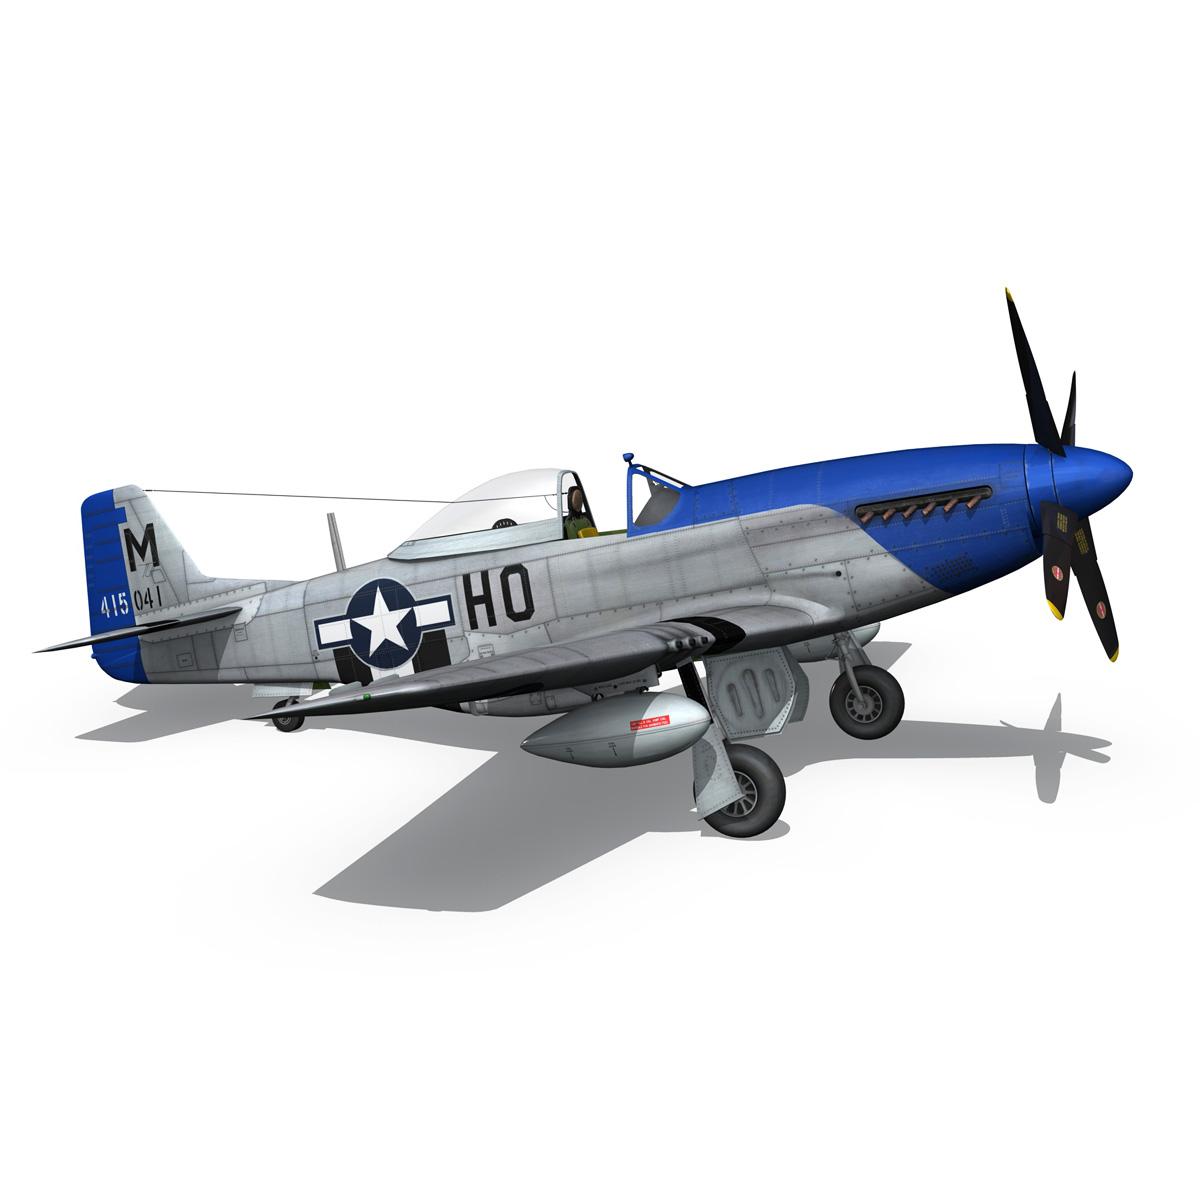 north american p-51d mustang – petie 3rd 3d model fbx c4d lwo obj 280141